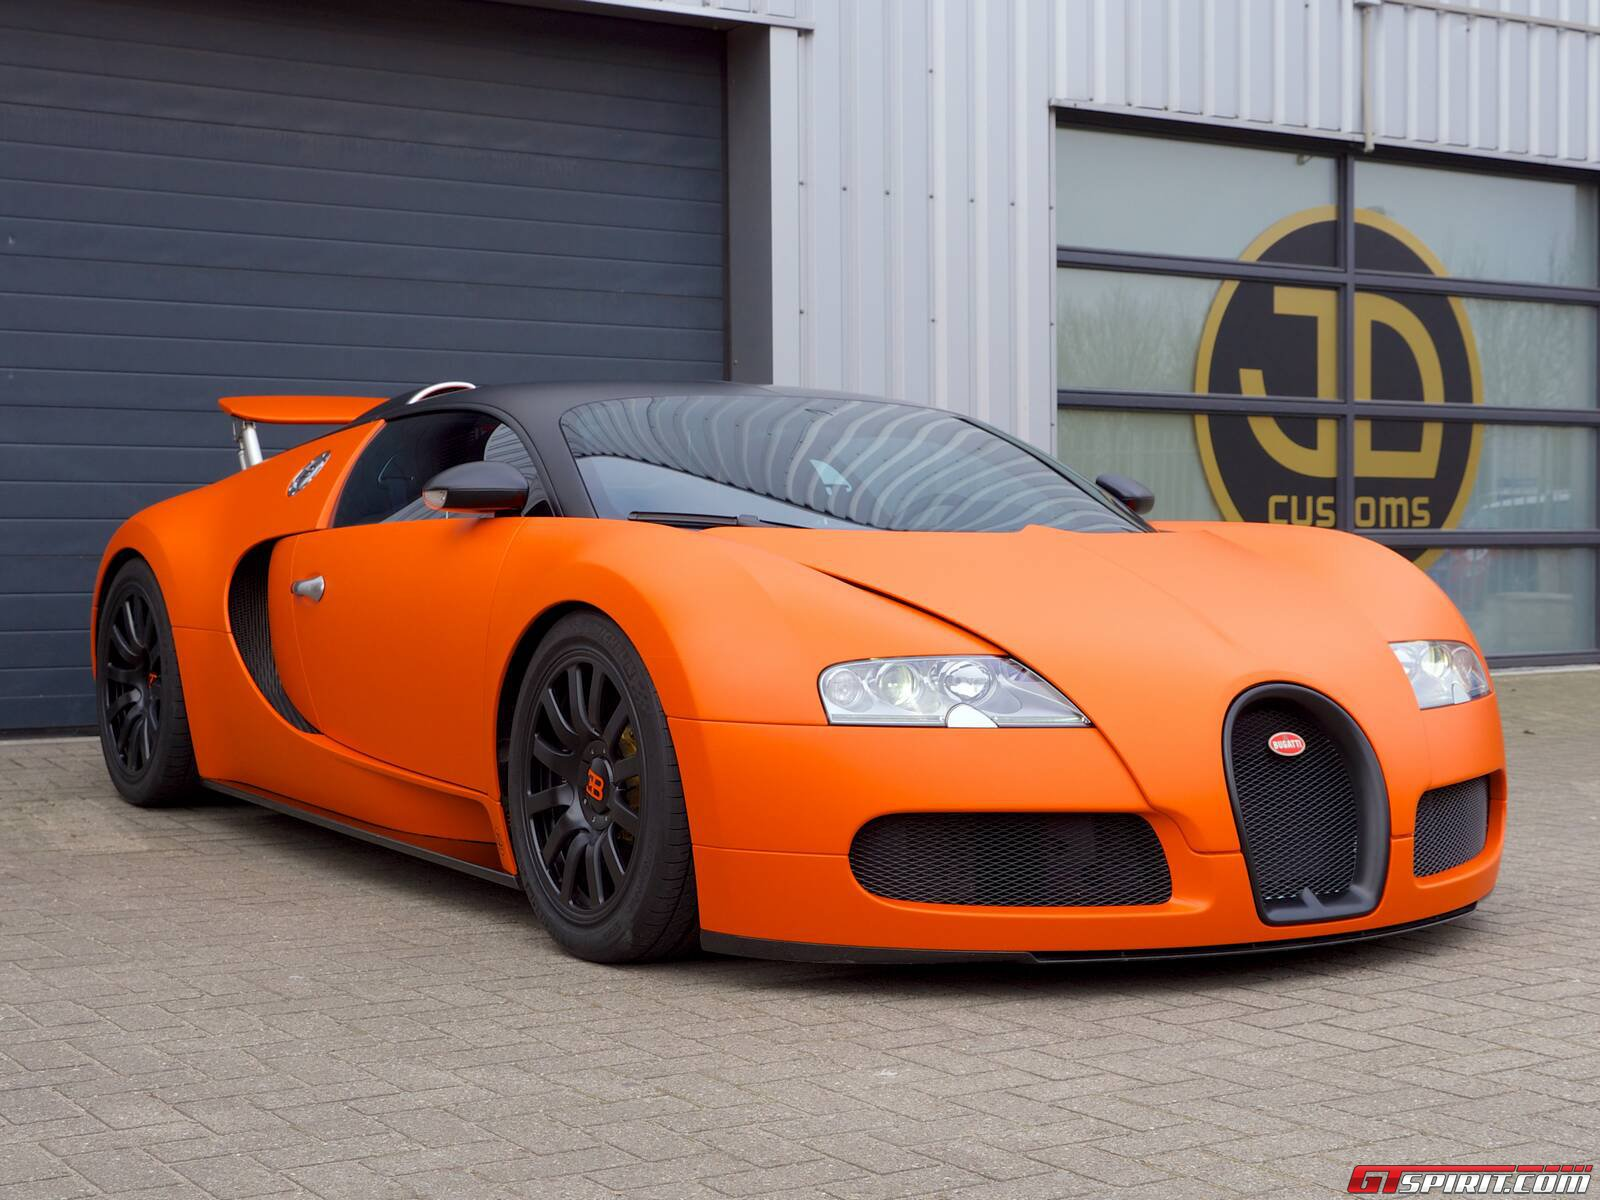 gallery matte orange bugatti veyron wrap by jd customs. Black Bedroom Furniture Sets. Home Design Ideas